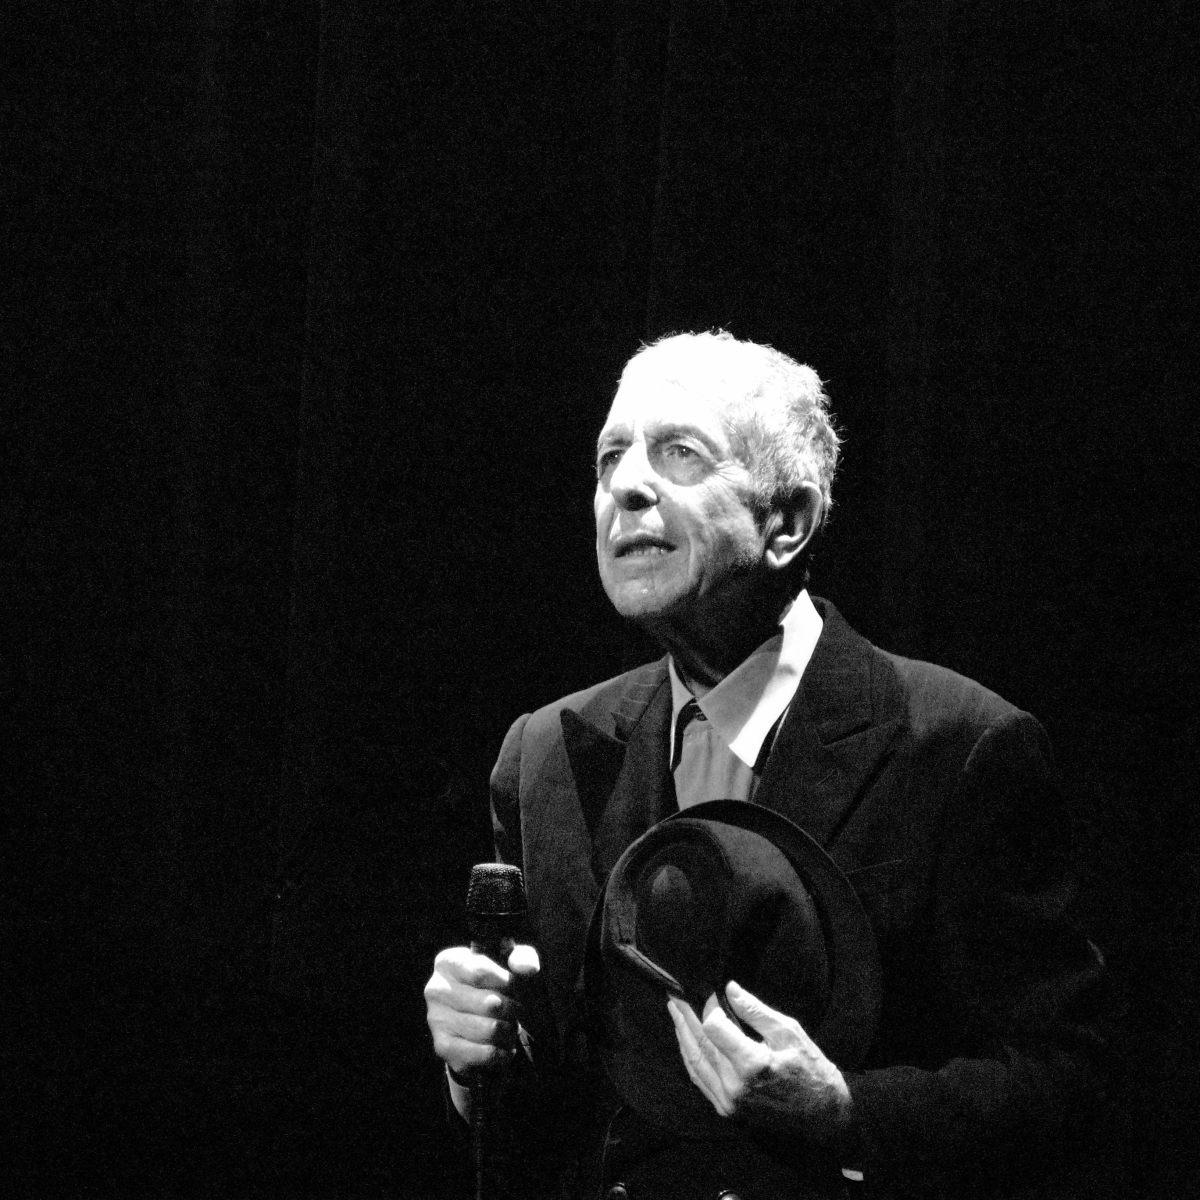 Leonard Cohen: Canadian Songwriter, Poet and Novelist